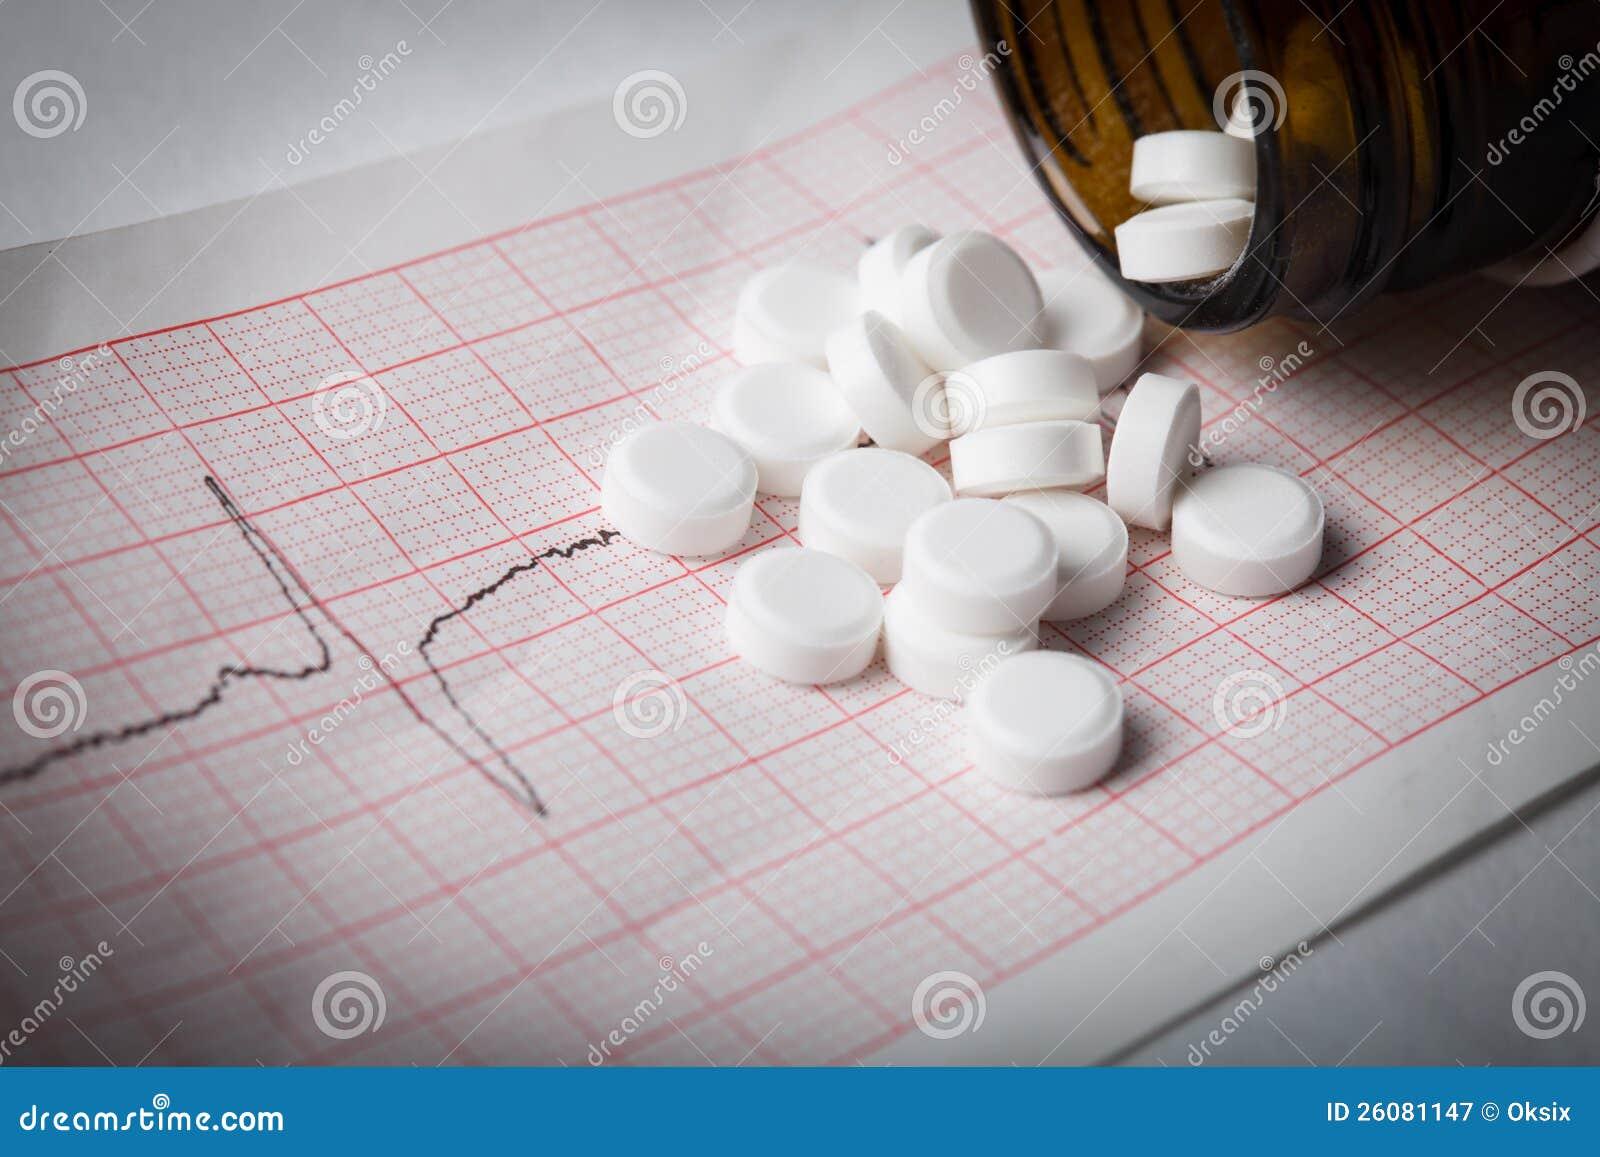 Cardiogramme et nitroglycérine